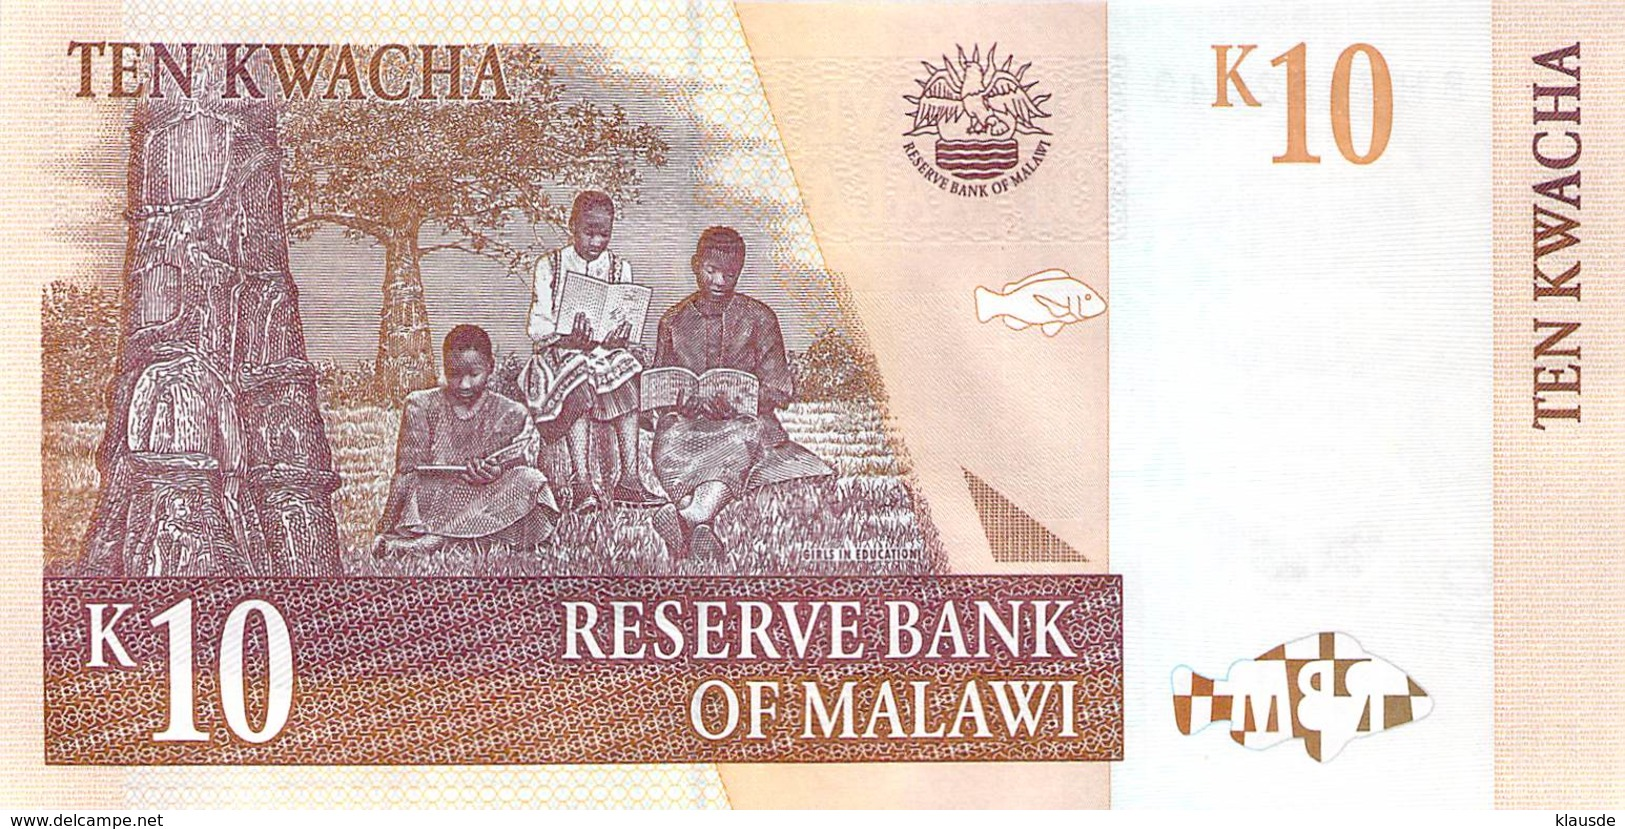 10 (TEN) Kwacha Malawi UNC 2004 - Malawi